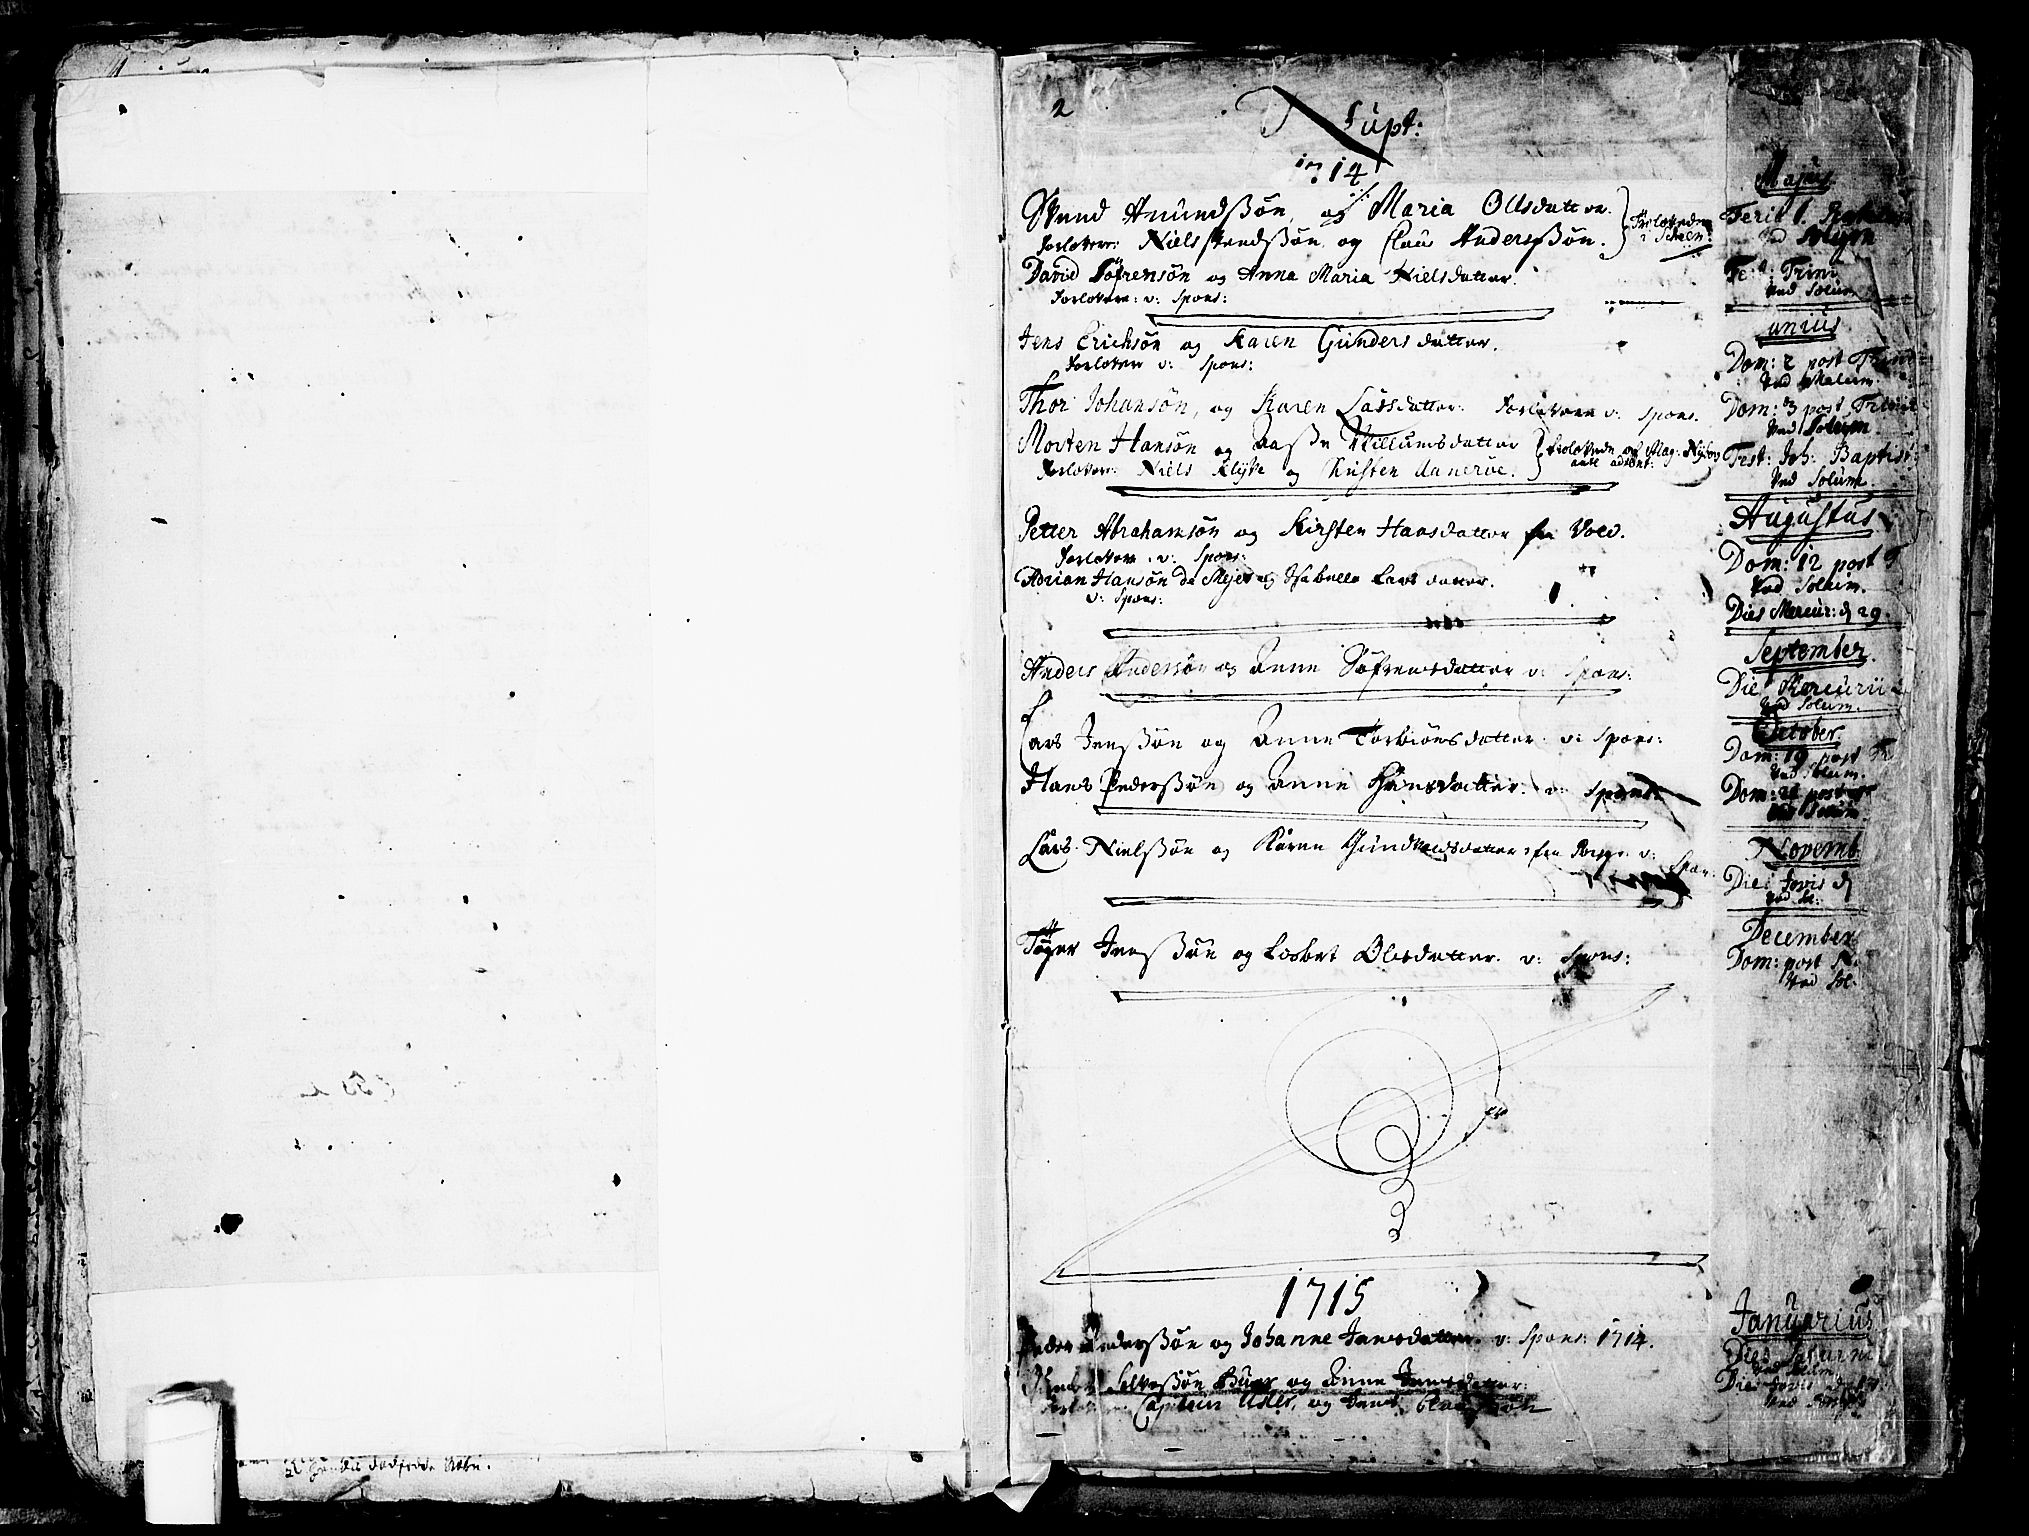 SAKO, Solum kirkebøker, F/Fa/L0002: Ministerialbok nr. I 2, 1713-1761, s. 176